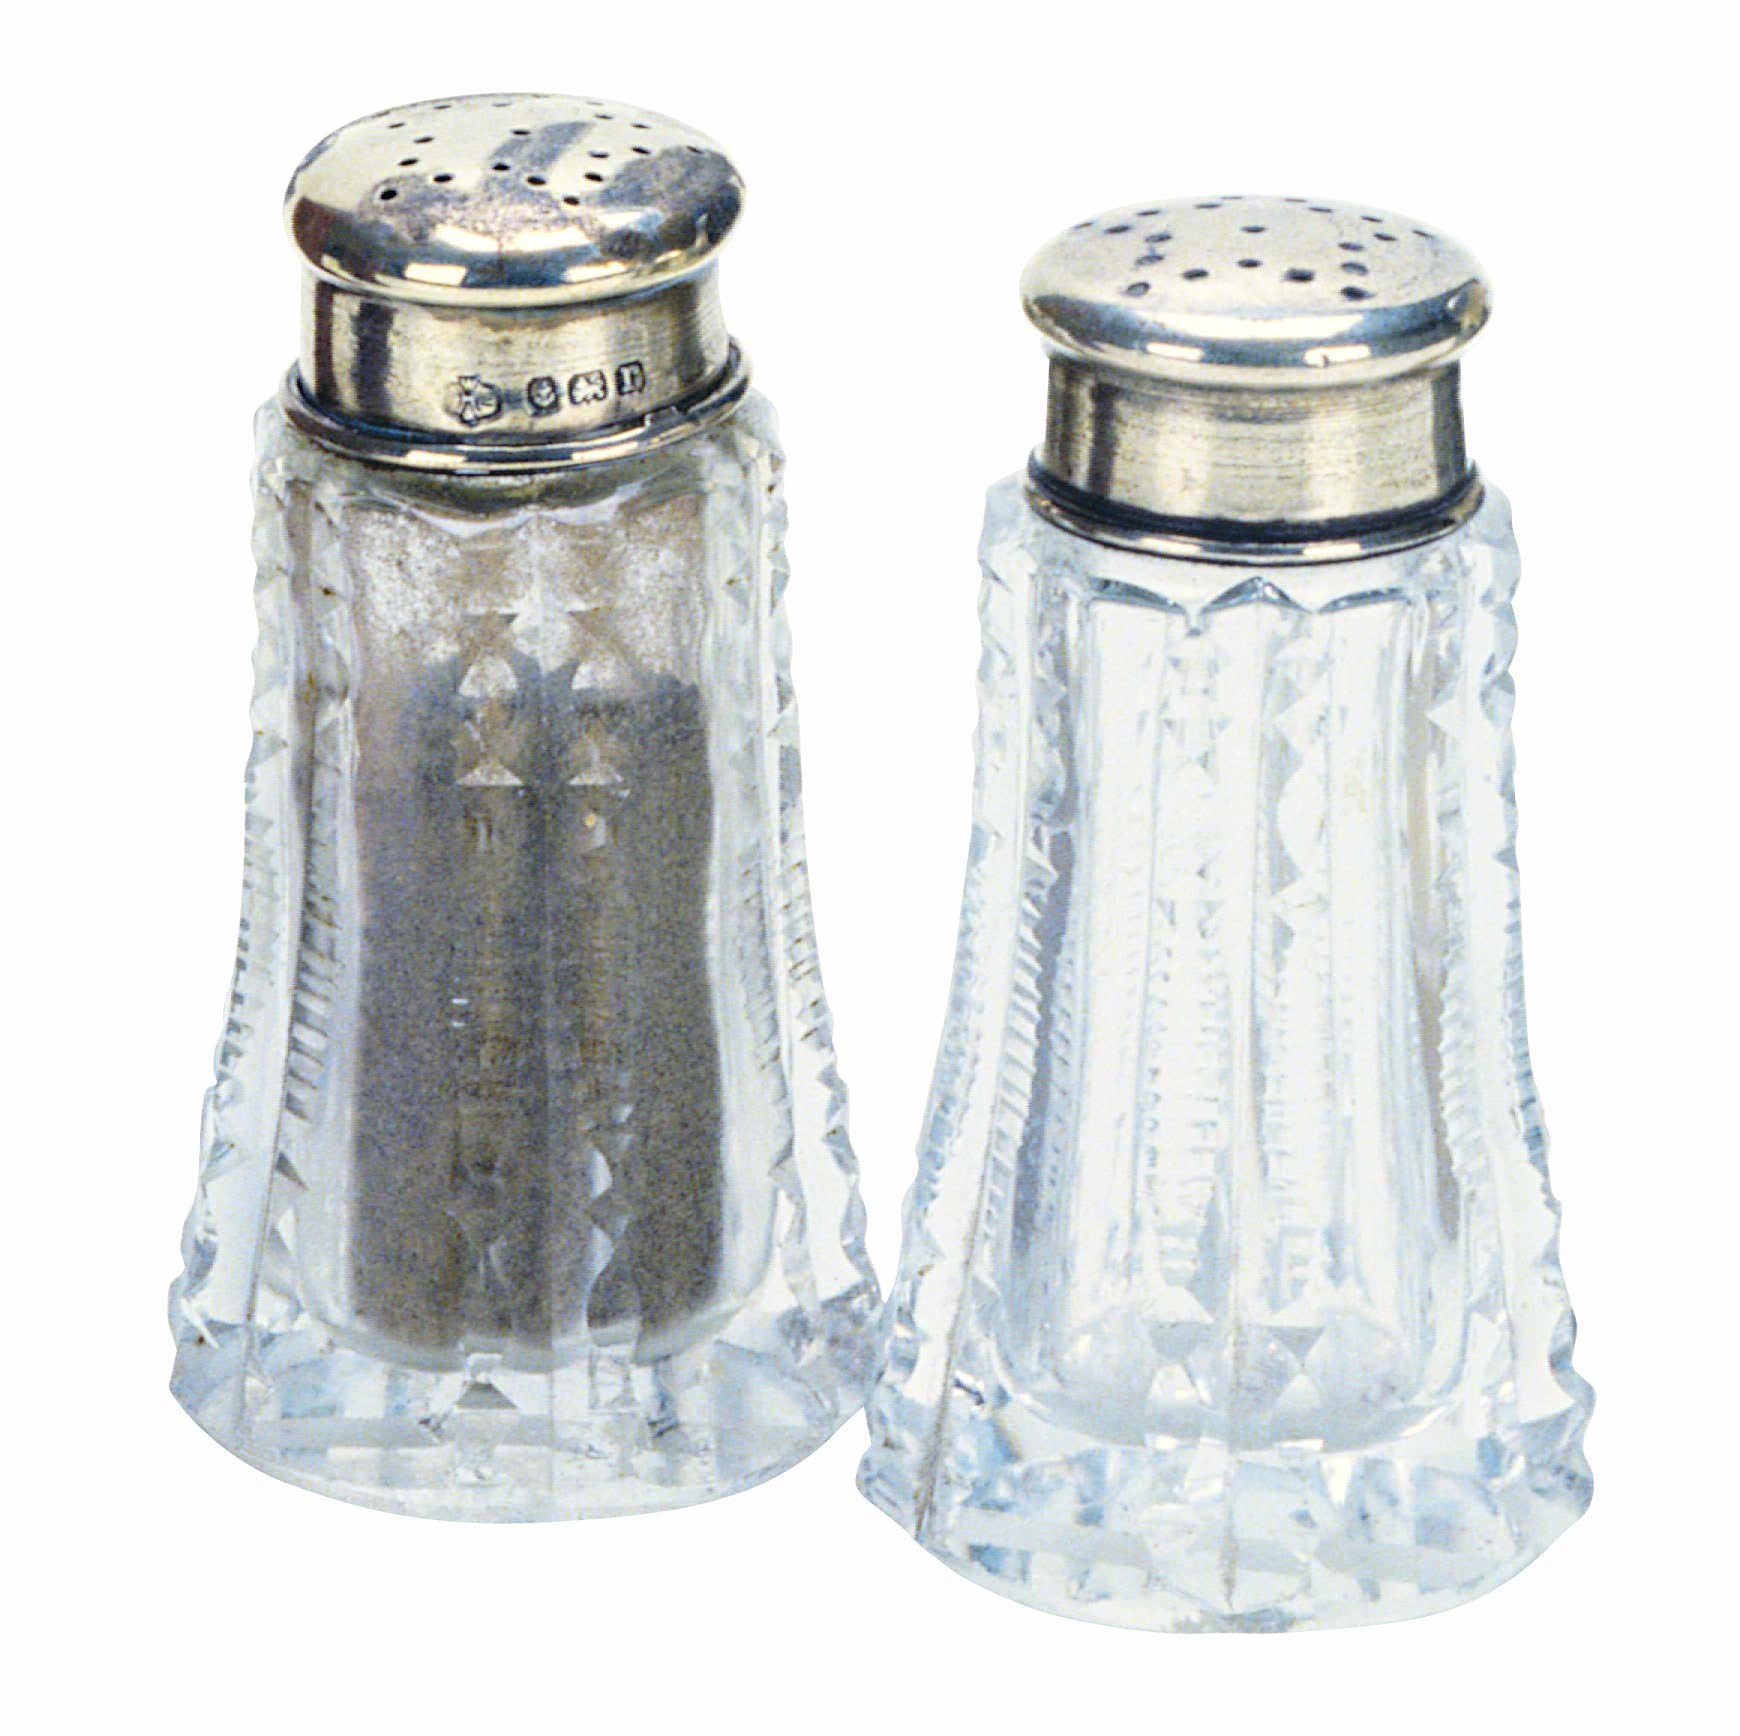 The Strange Table World Of Salt And Pepper Shakers